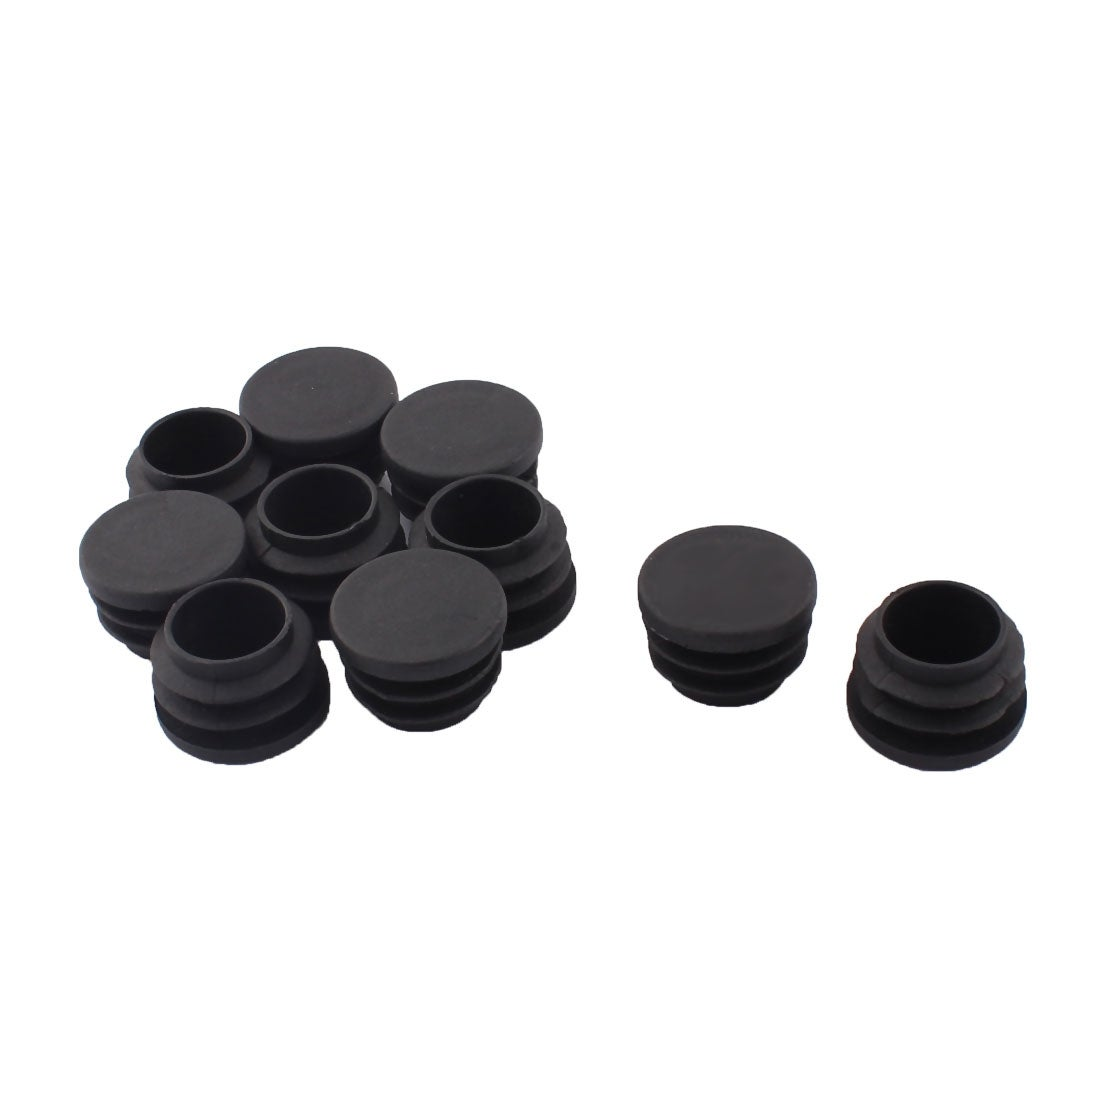 Furniture Clever Plastic Round Tubing Tube Insert Plug Cap Bung 28mm Dia 20pcs Black Soft And Antislippery